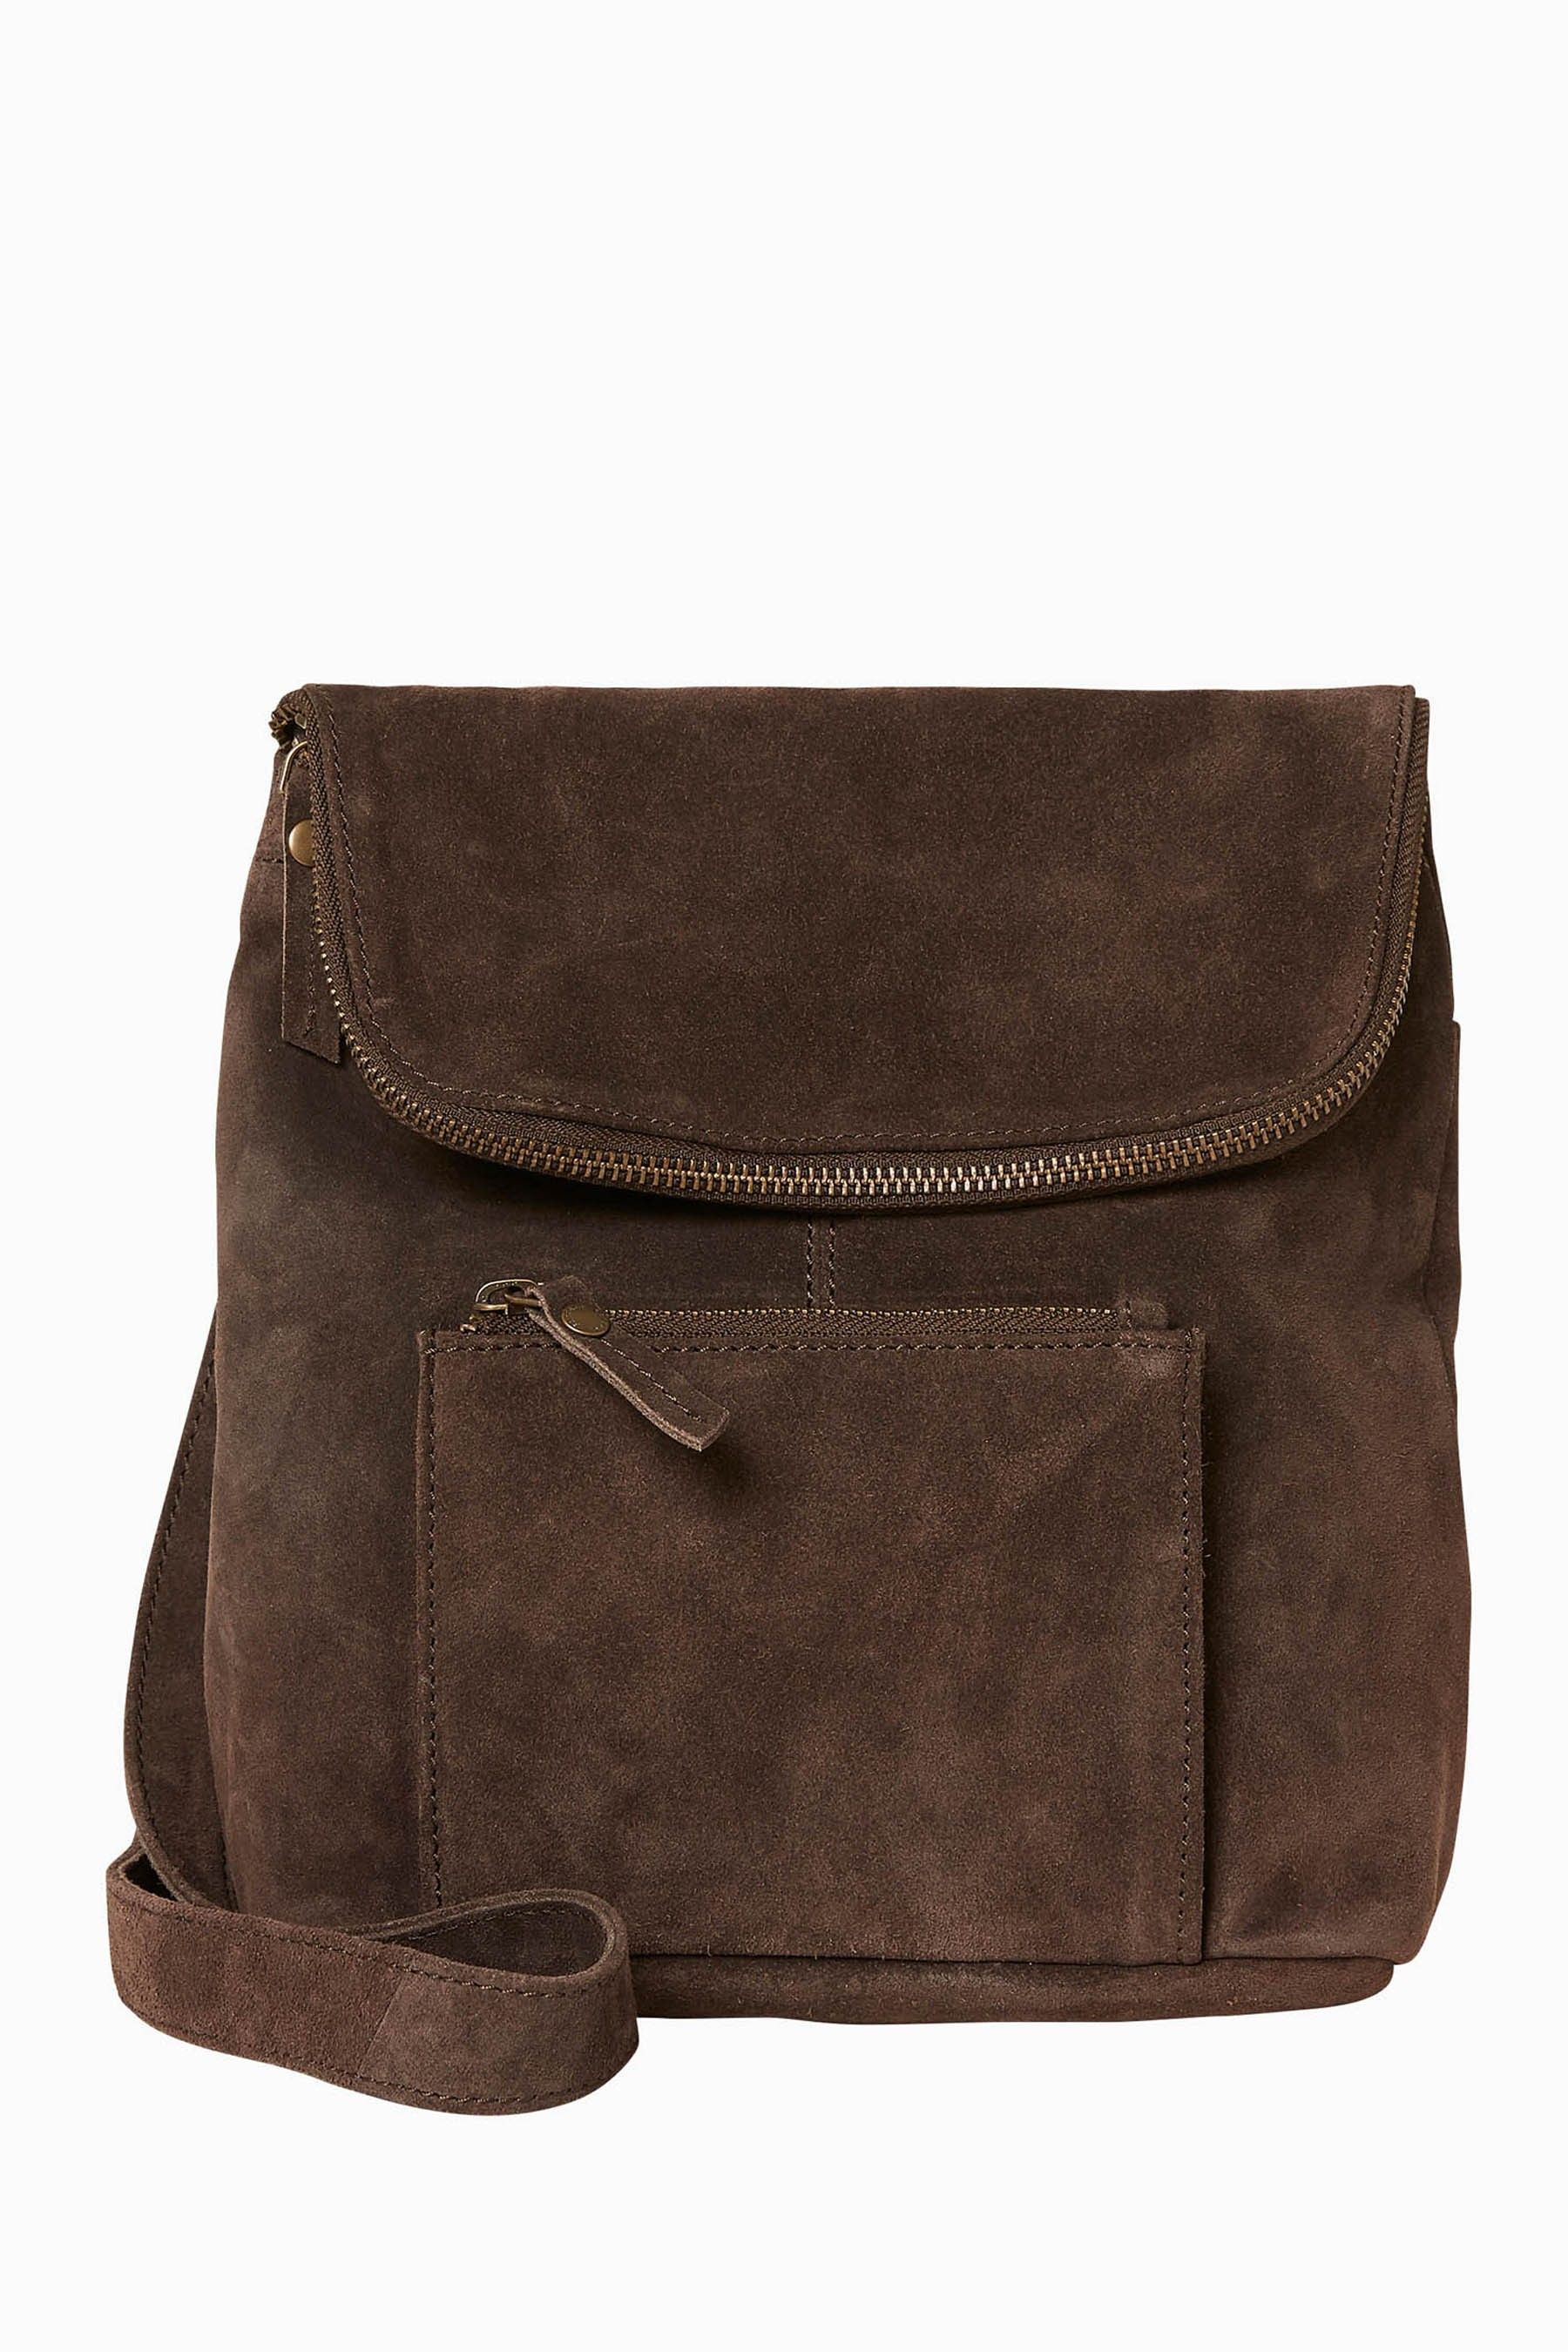 1ca351b2c9f5 Womens FatFace Grey Mini Tara Multifunctional Bag - Grey | Products ...